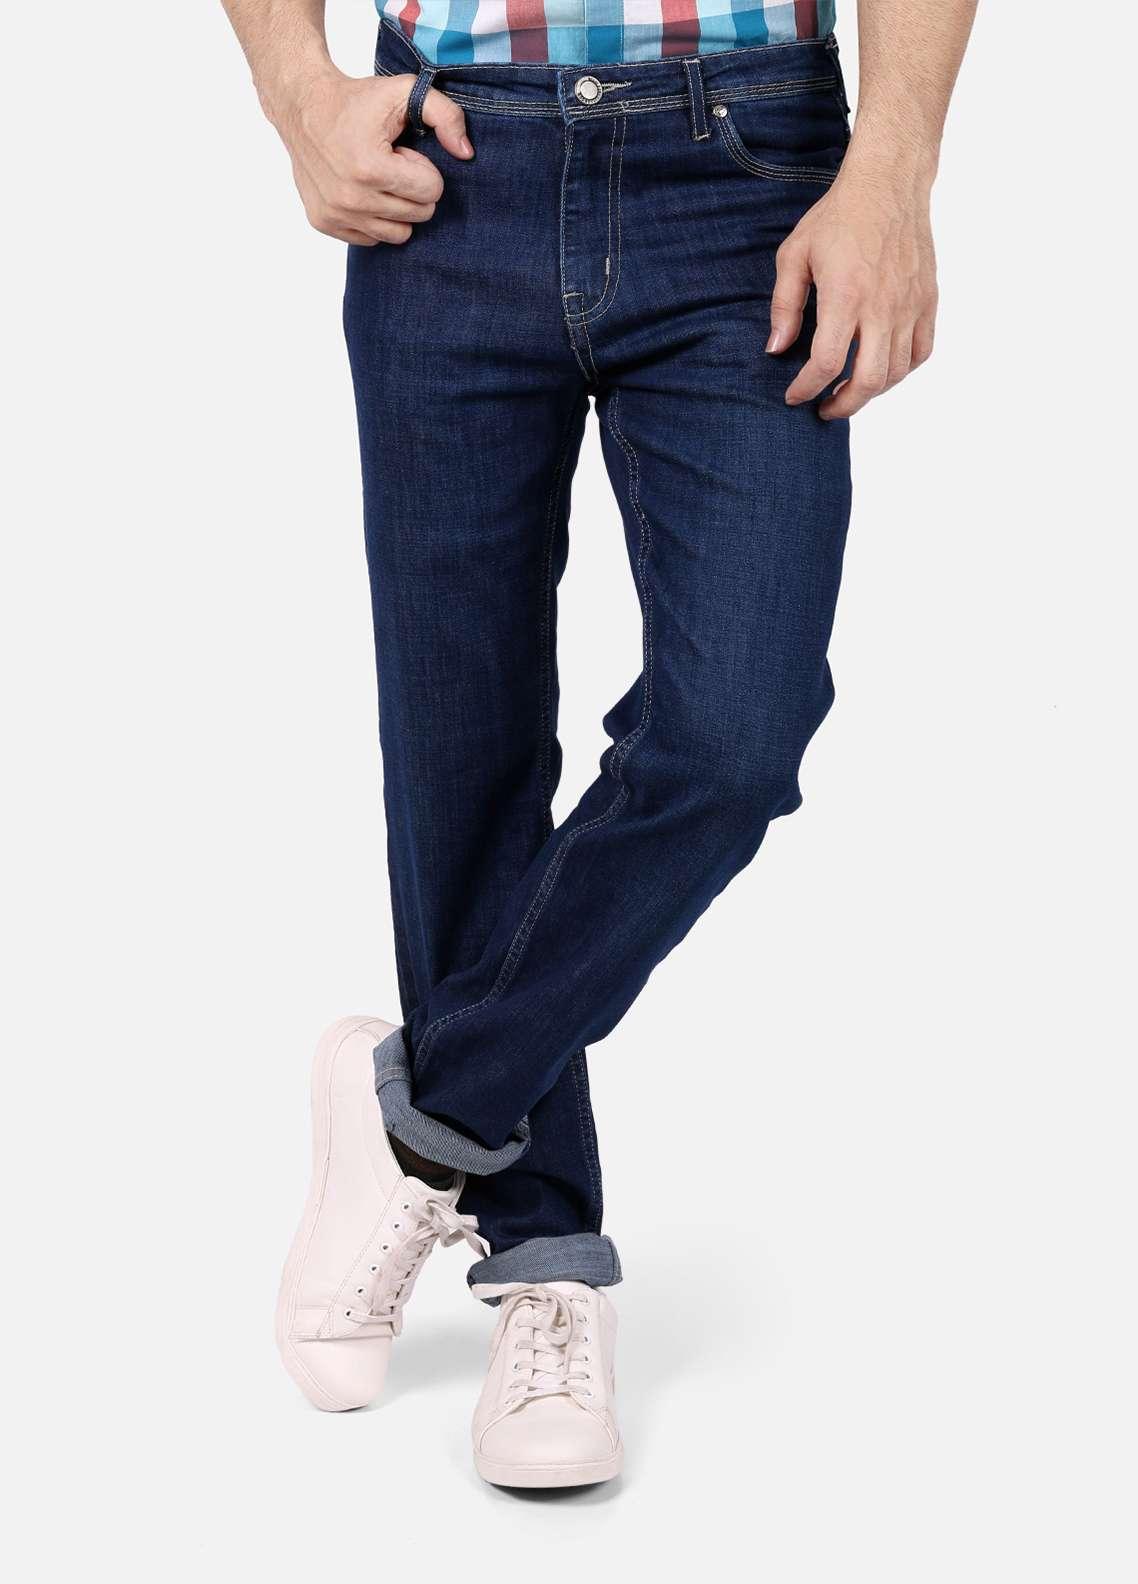 Furor Denim Casual Men Jeans - Blue FRM18DP 021